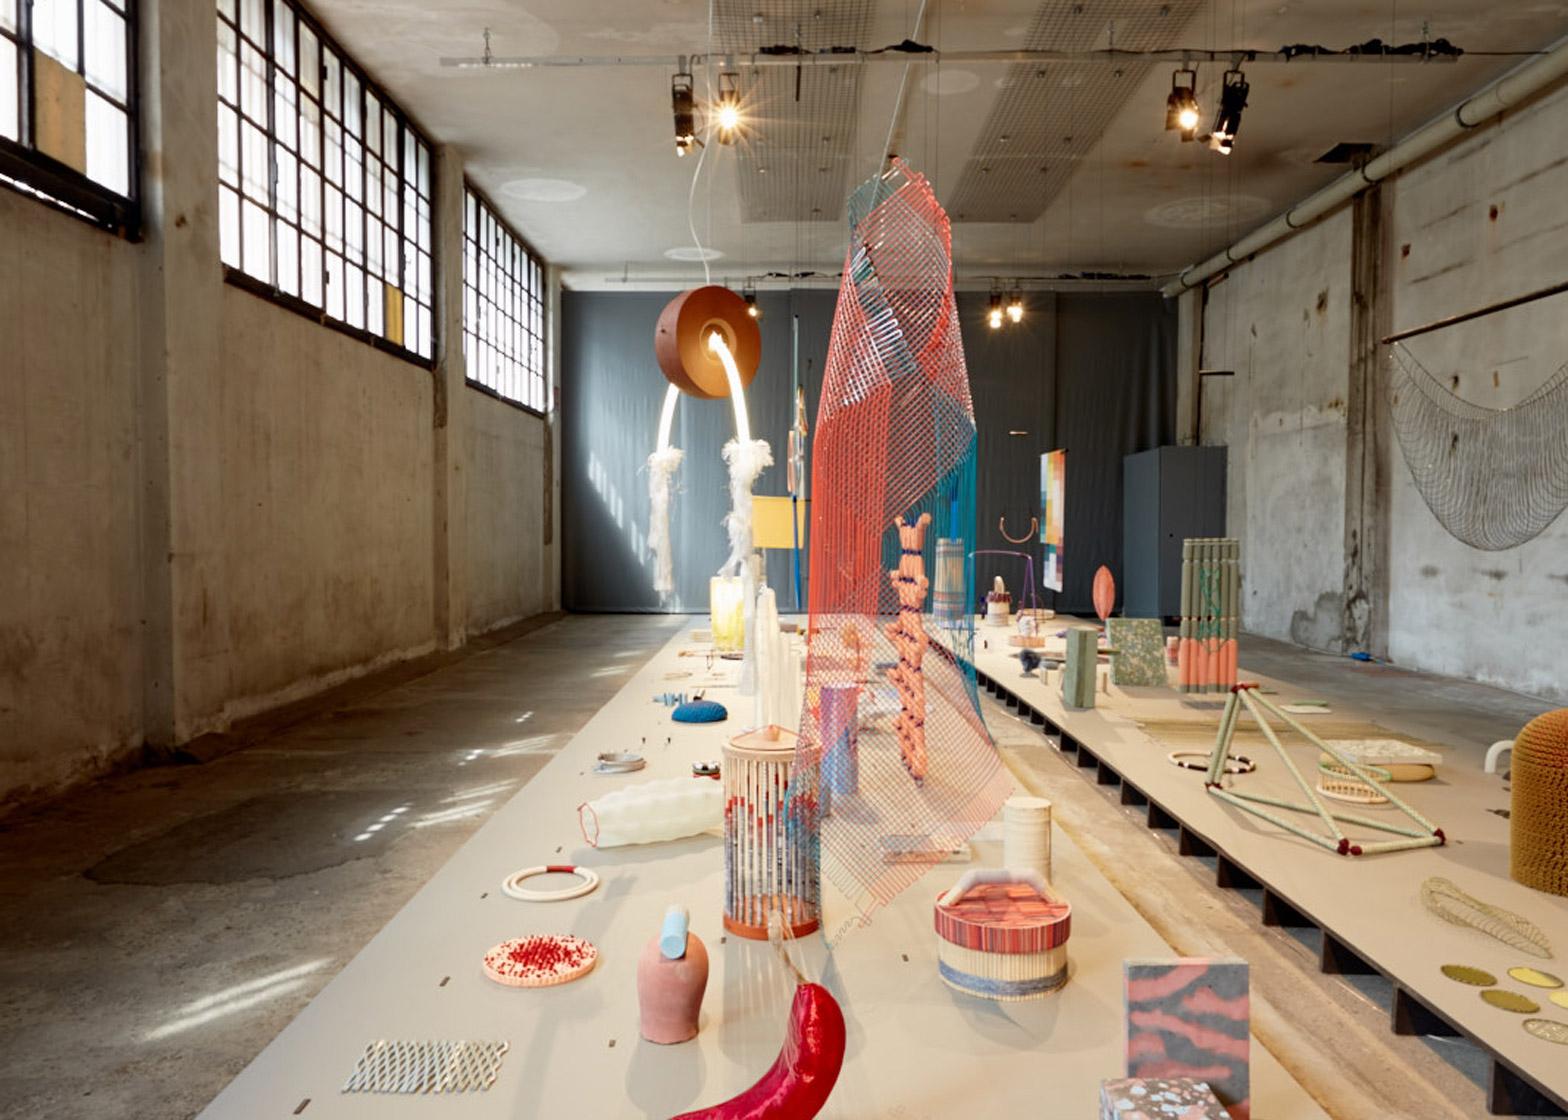 Envisions exhibition by Design Academy Eindhoven graduates